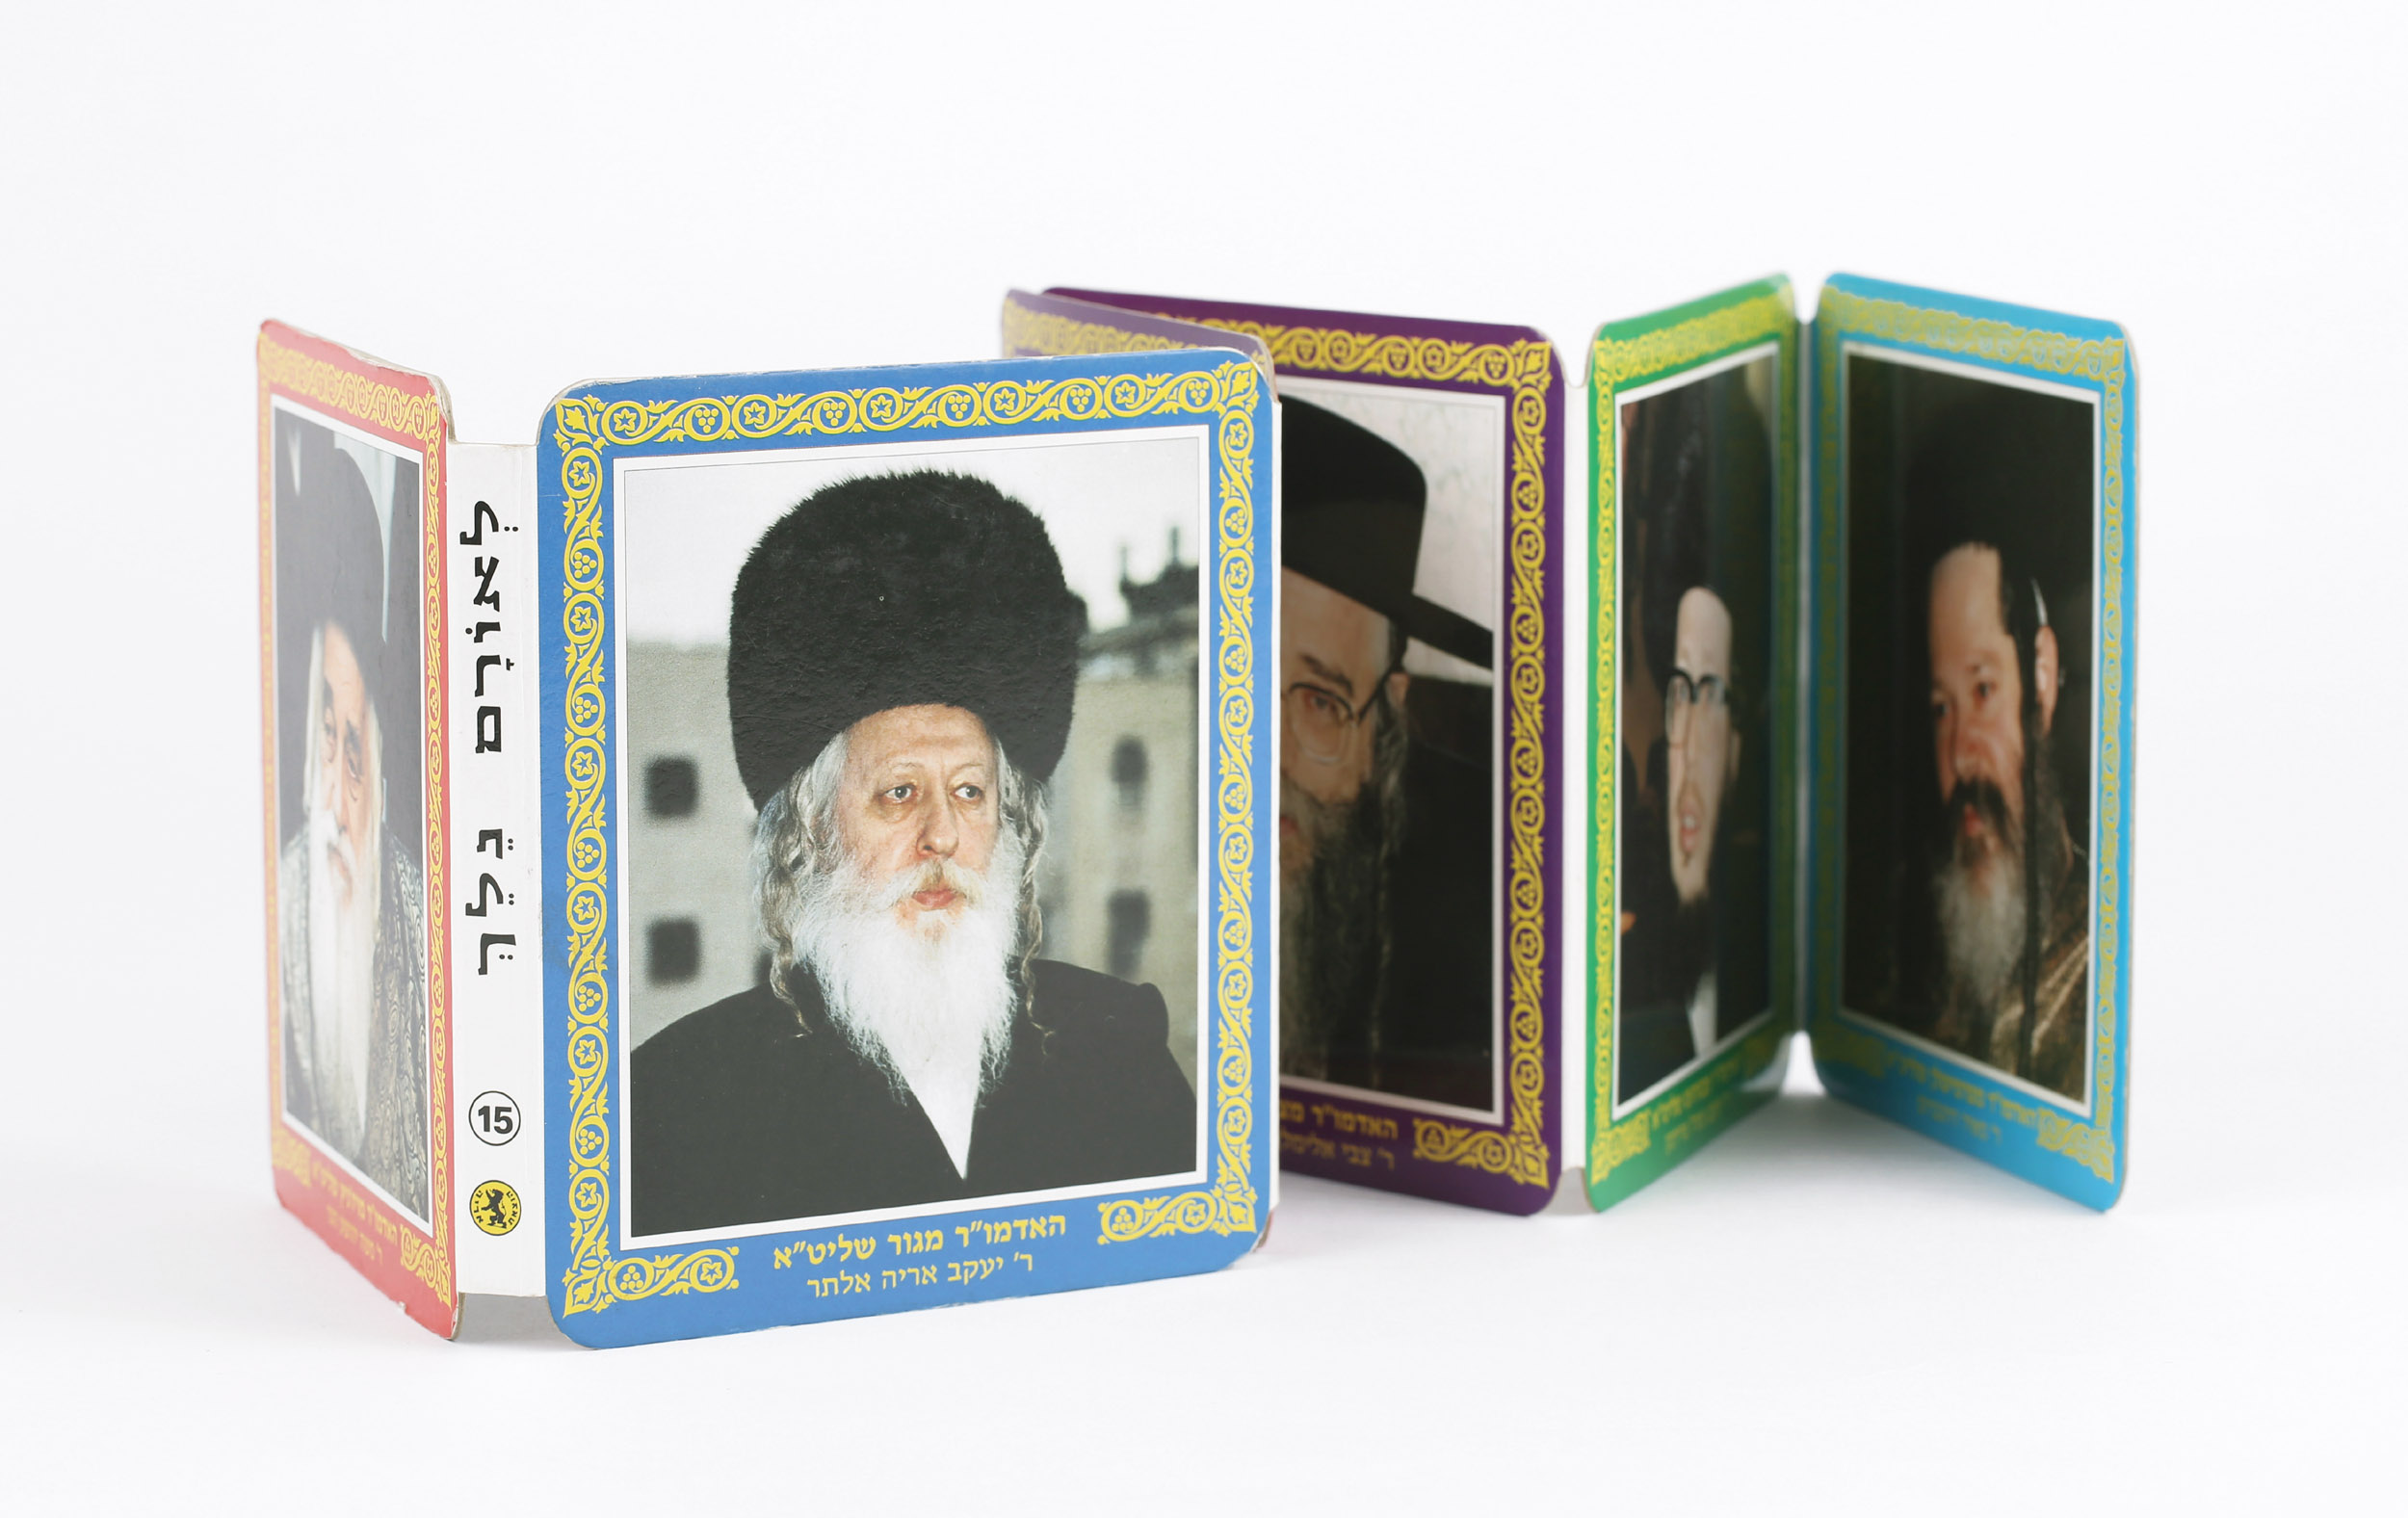 Stroller rabbis baby book